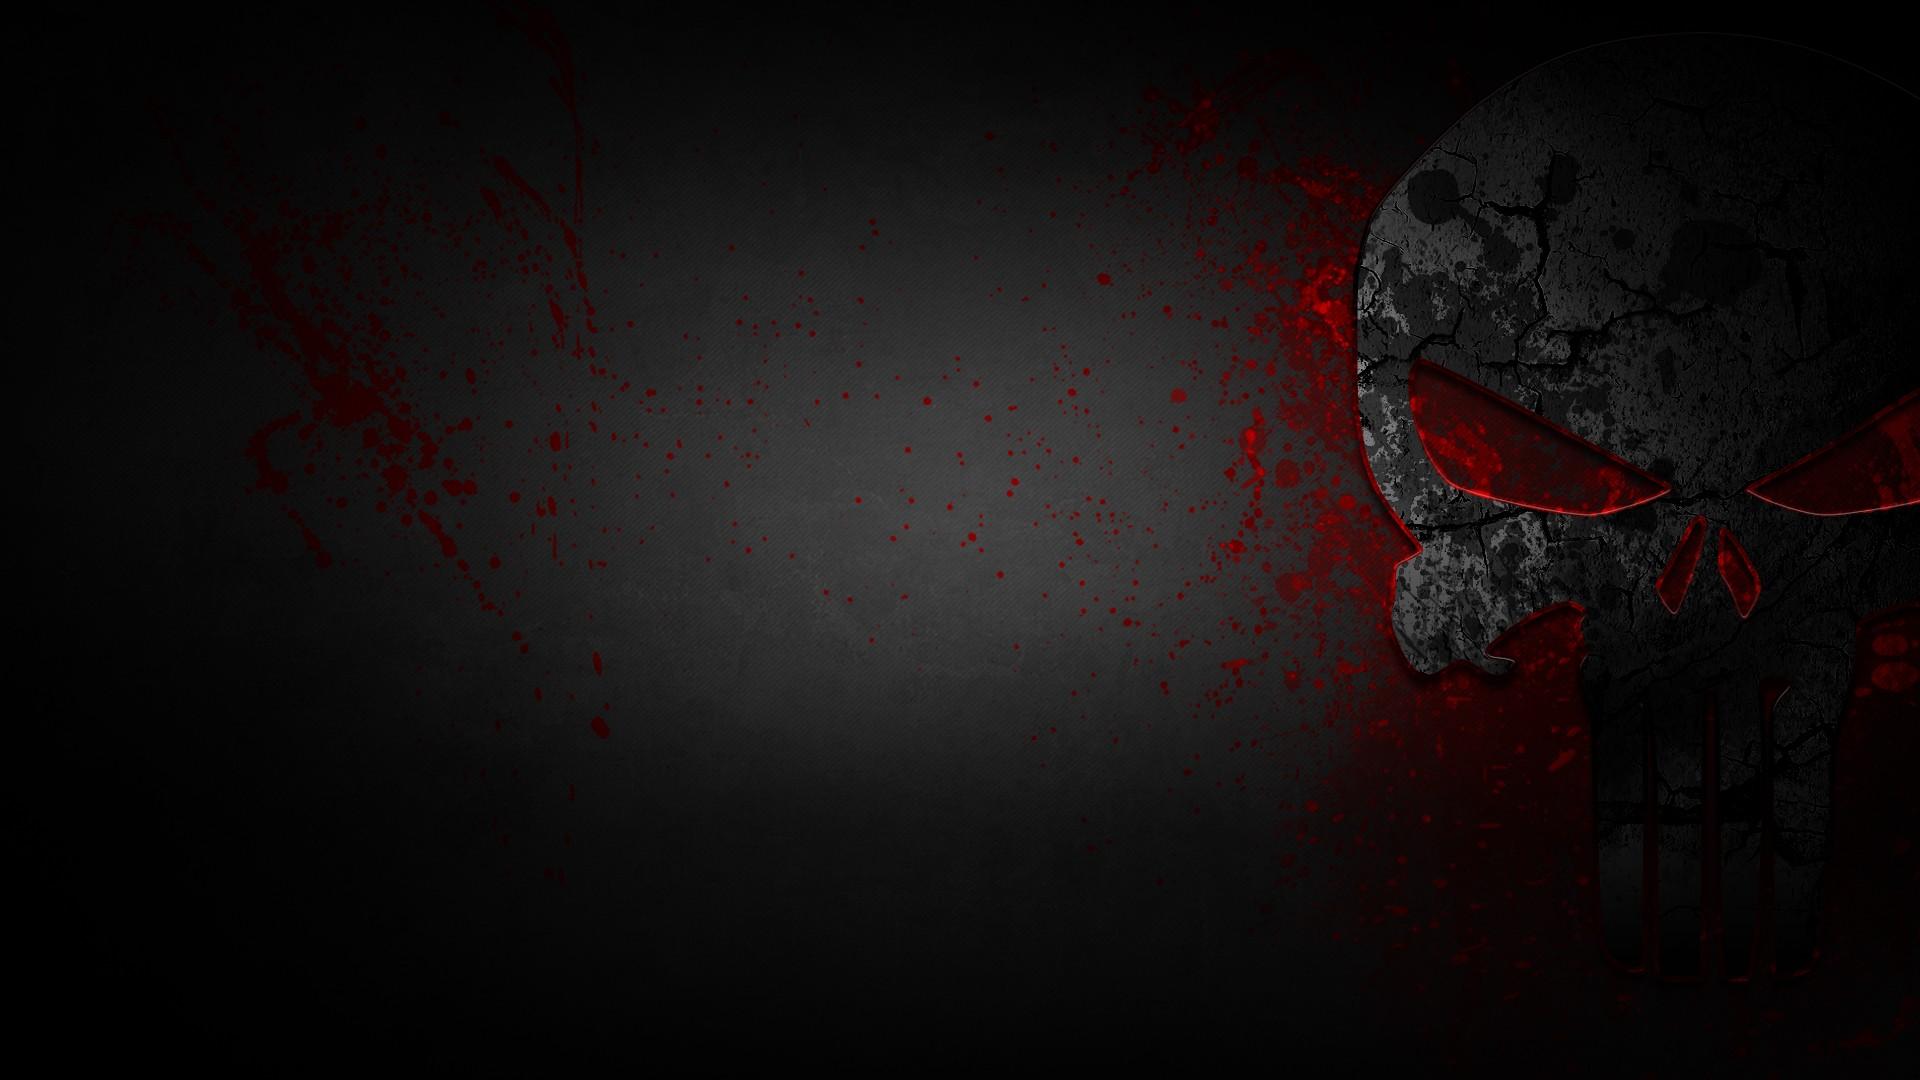 Punisher wallpaper | 1920x1080 | 226457 | WallpaperUP